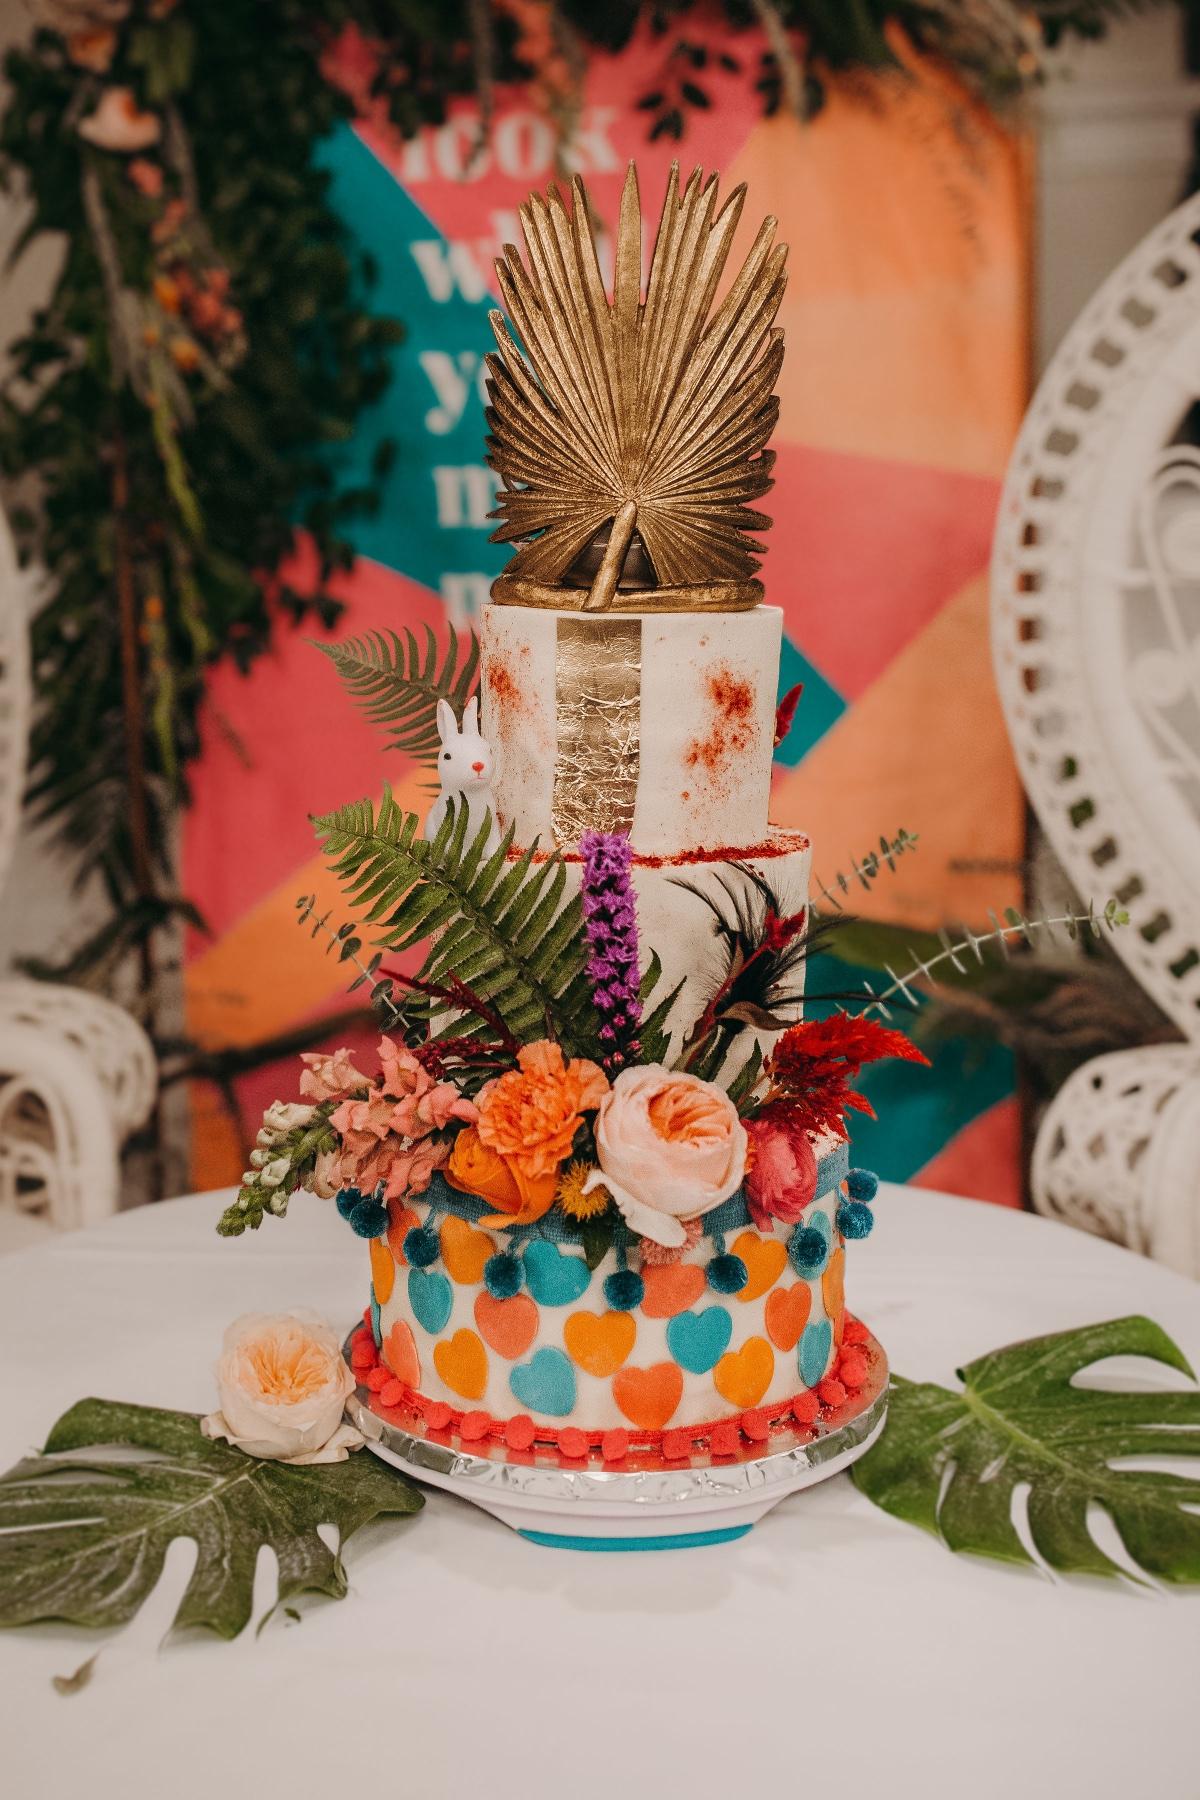 love-fern-design-studio-custom-wedding-invitations-for-the-modern-couple-modern-calligraphy-in-seattle-washington-custom-wedding-stationery-neon-acrylic-eclectic-alice-wonderland-wedding-cake